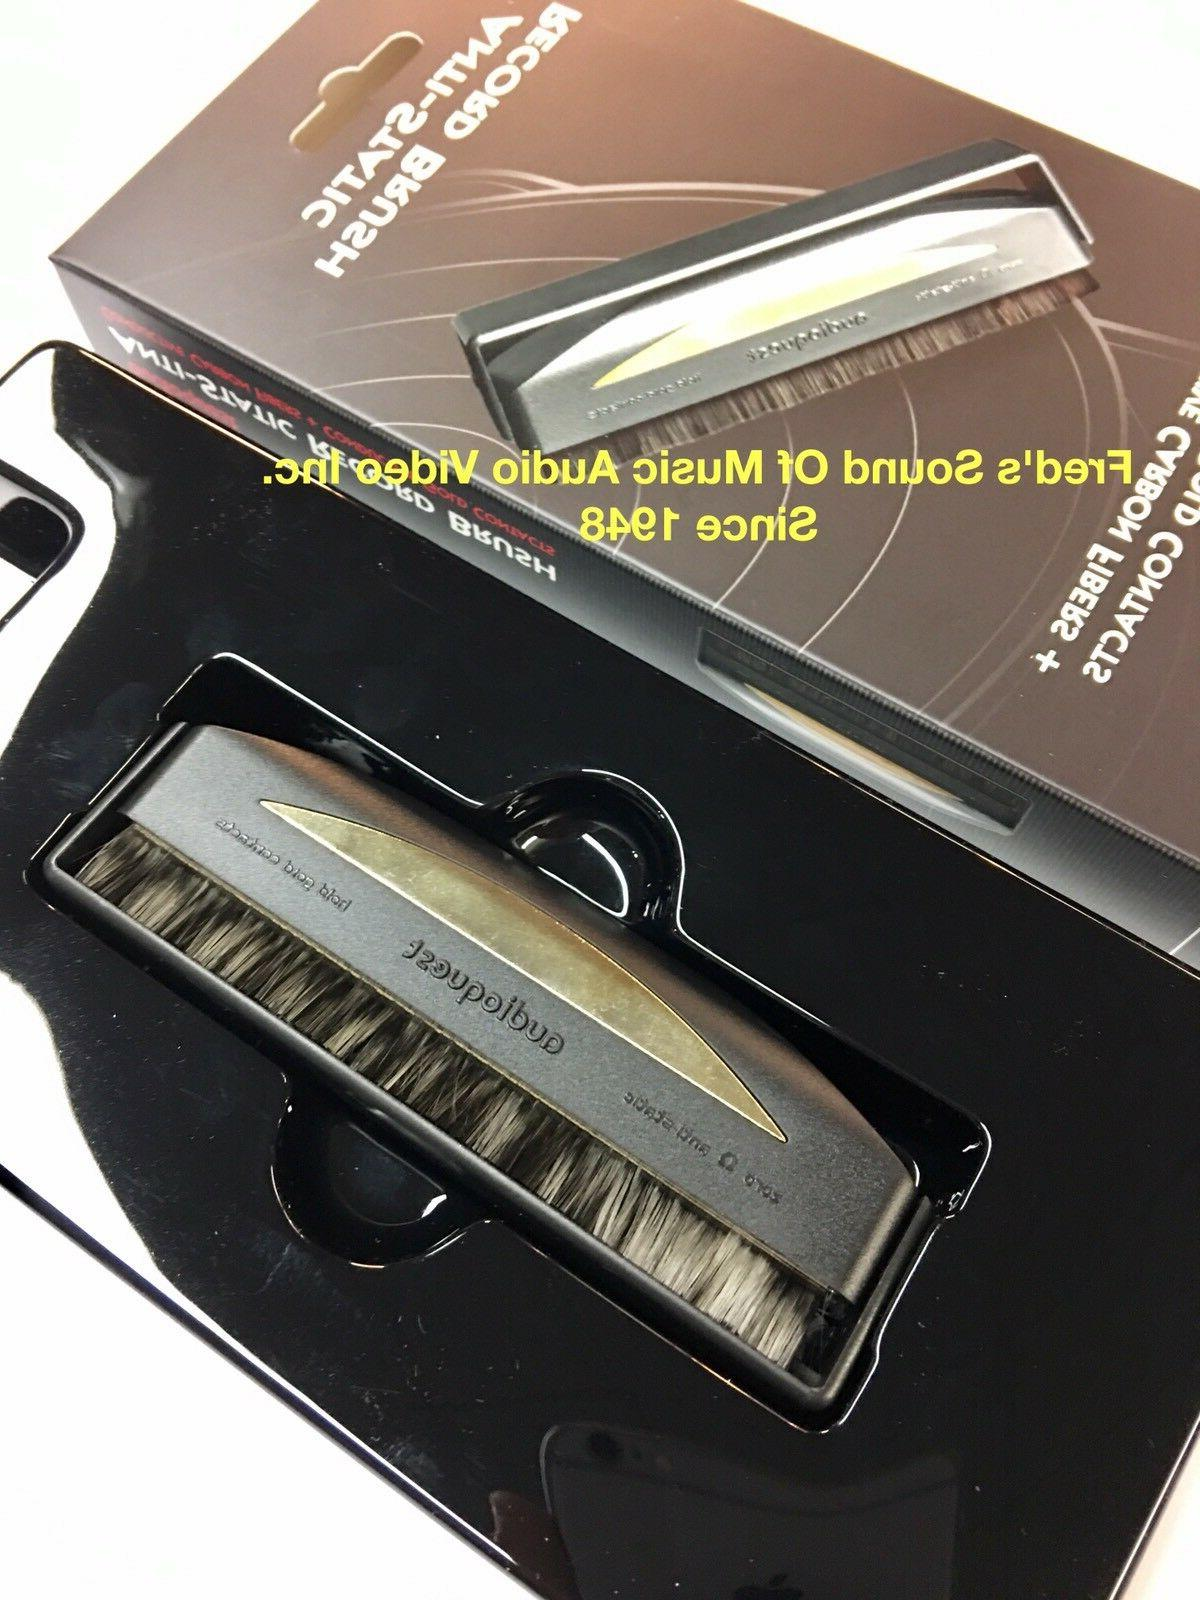 Audioquest Anti-Static Record Cleaning Brush w/box